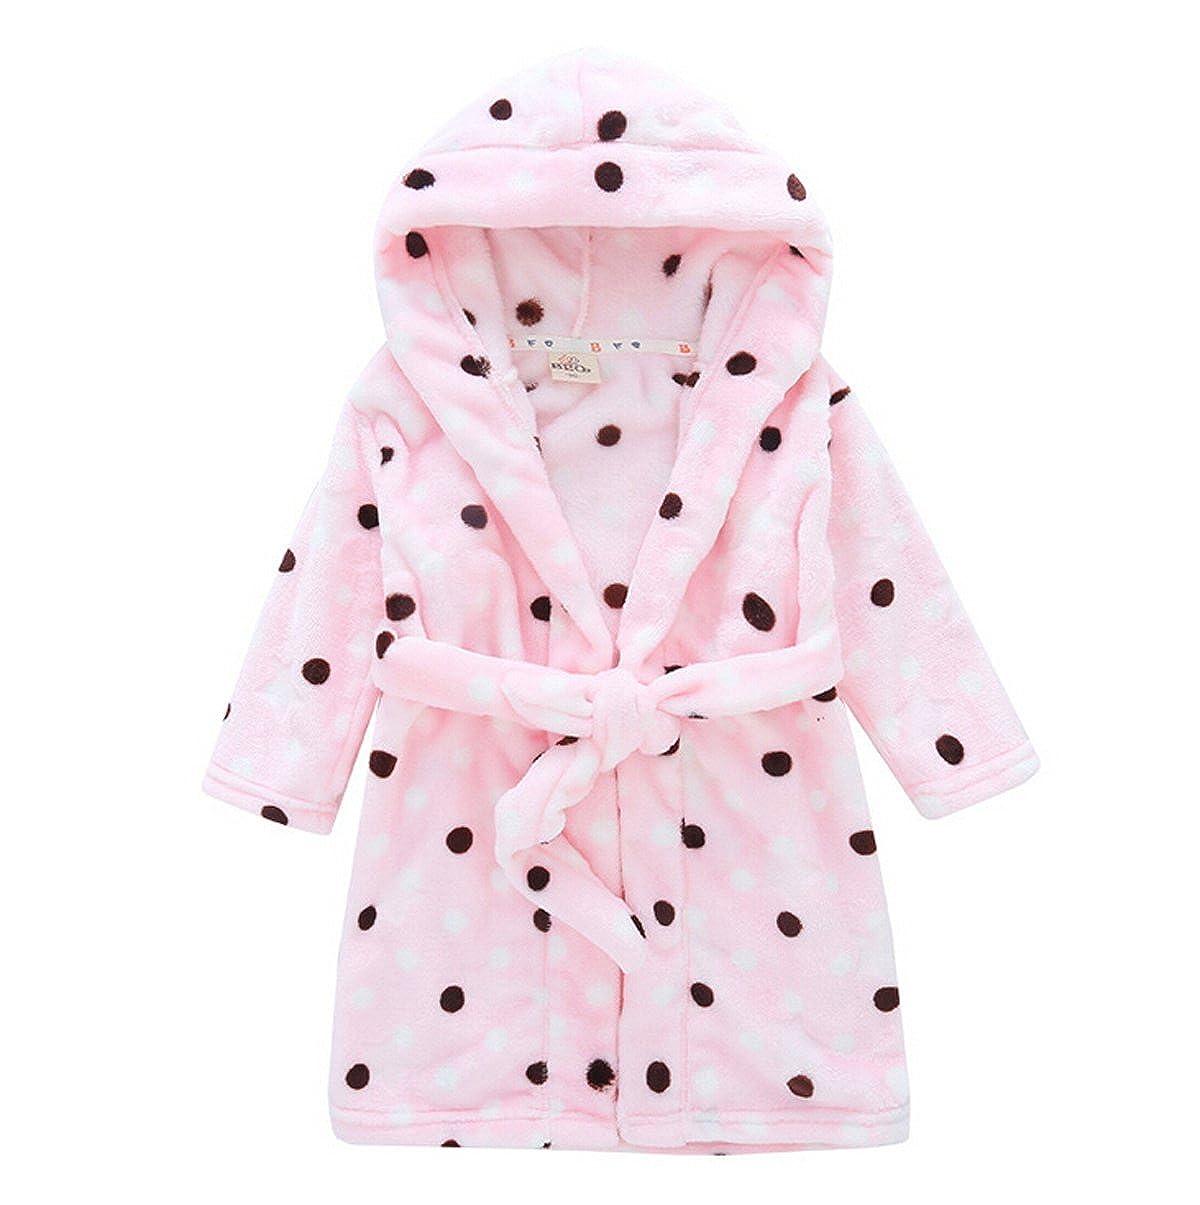 72b3582464 Amazon.com  Toddler   Kids   Baby Soft Fleece Warm Bath Robe Hooded Pajamas